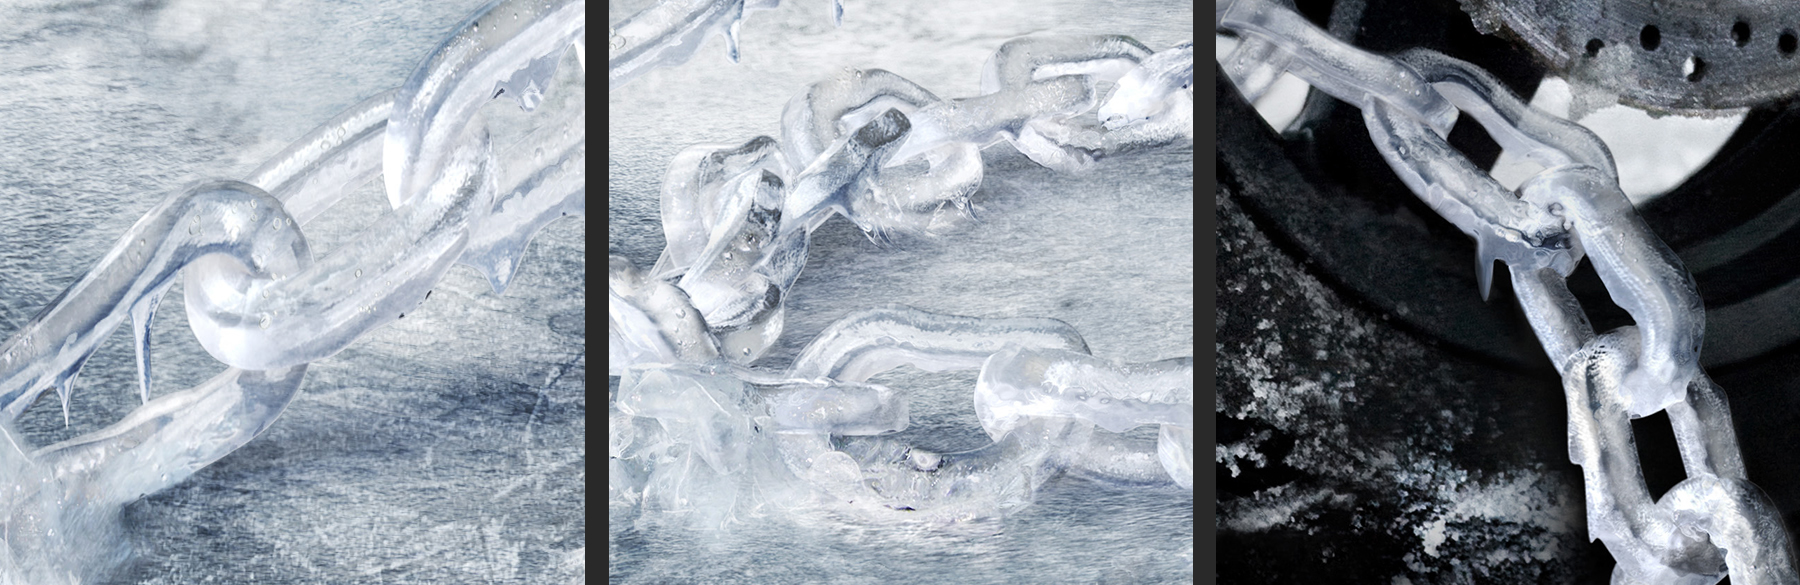 Prisma Associati</br>Yamaha – Ice chain